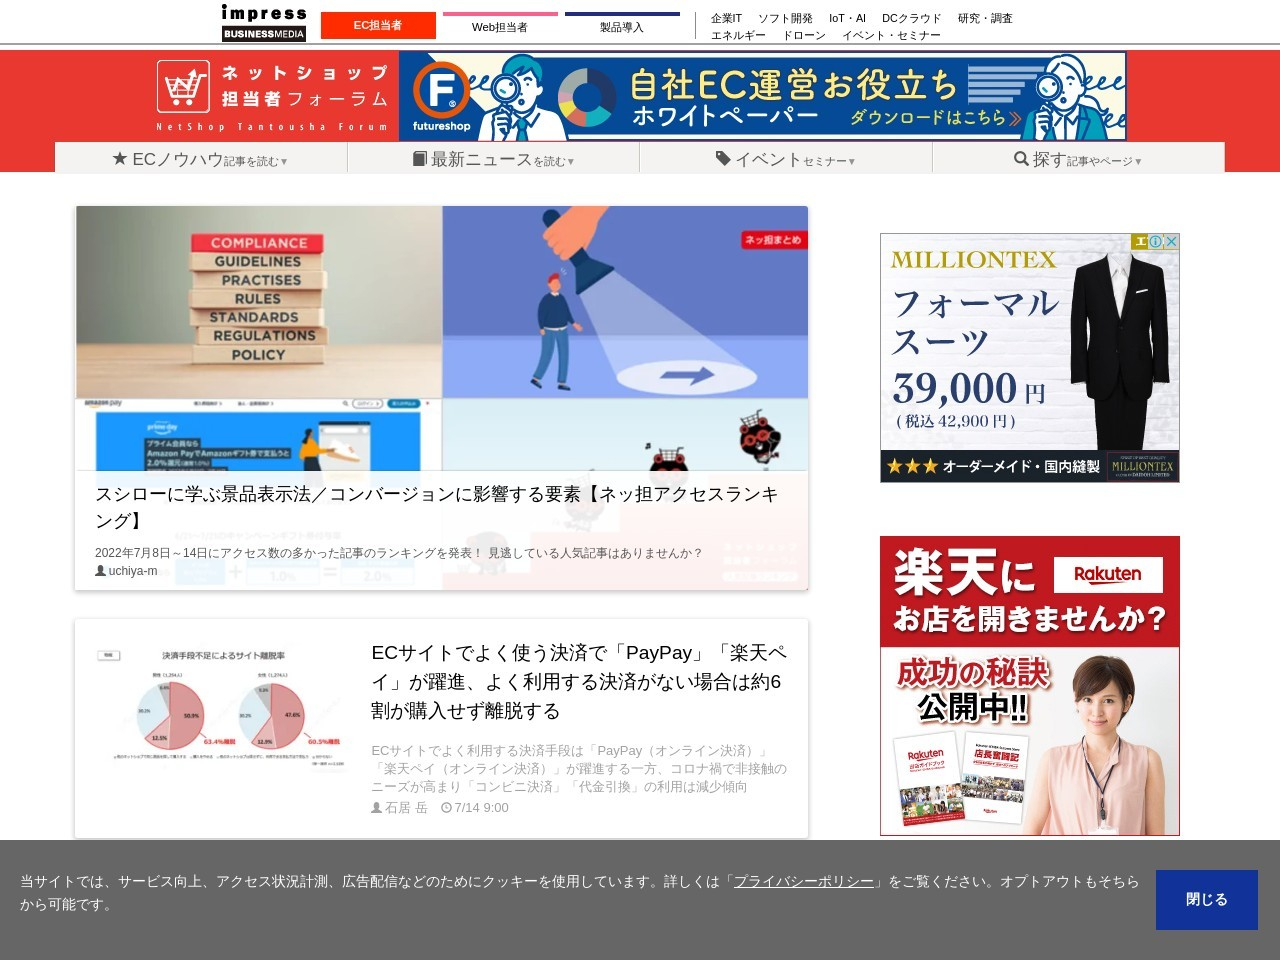 https://netshop.impress.co.jp/node/220